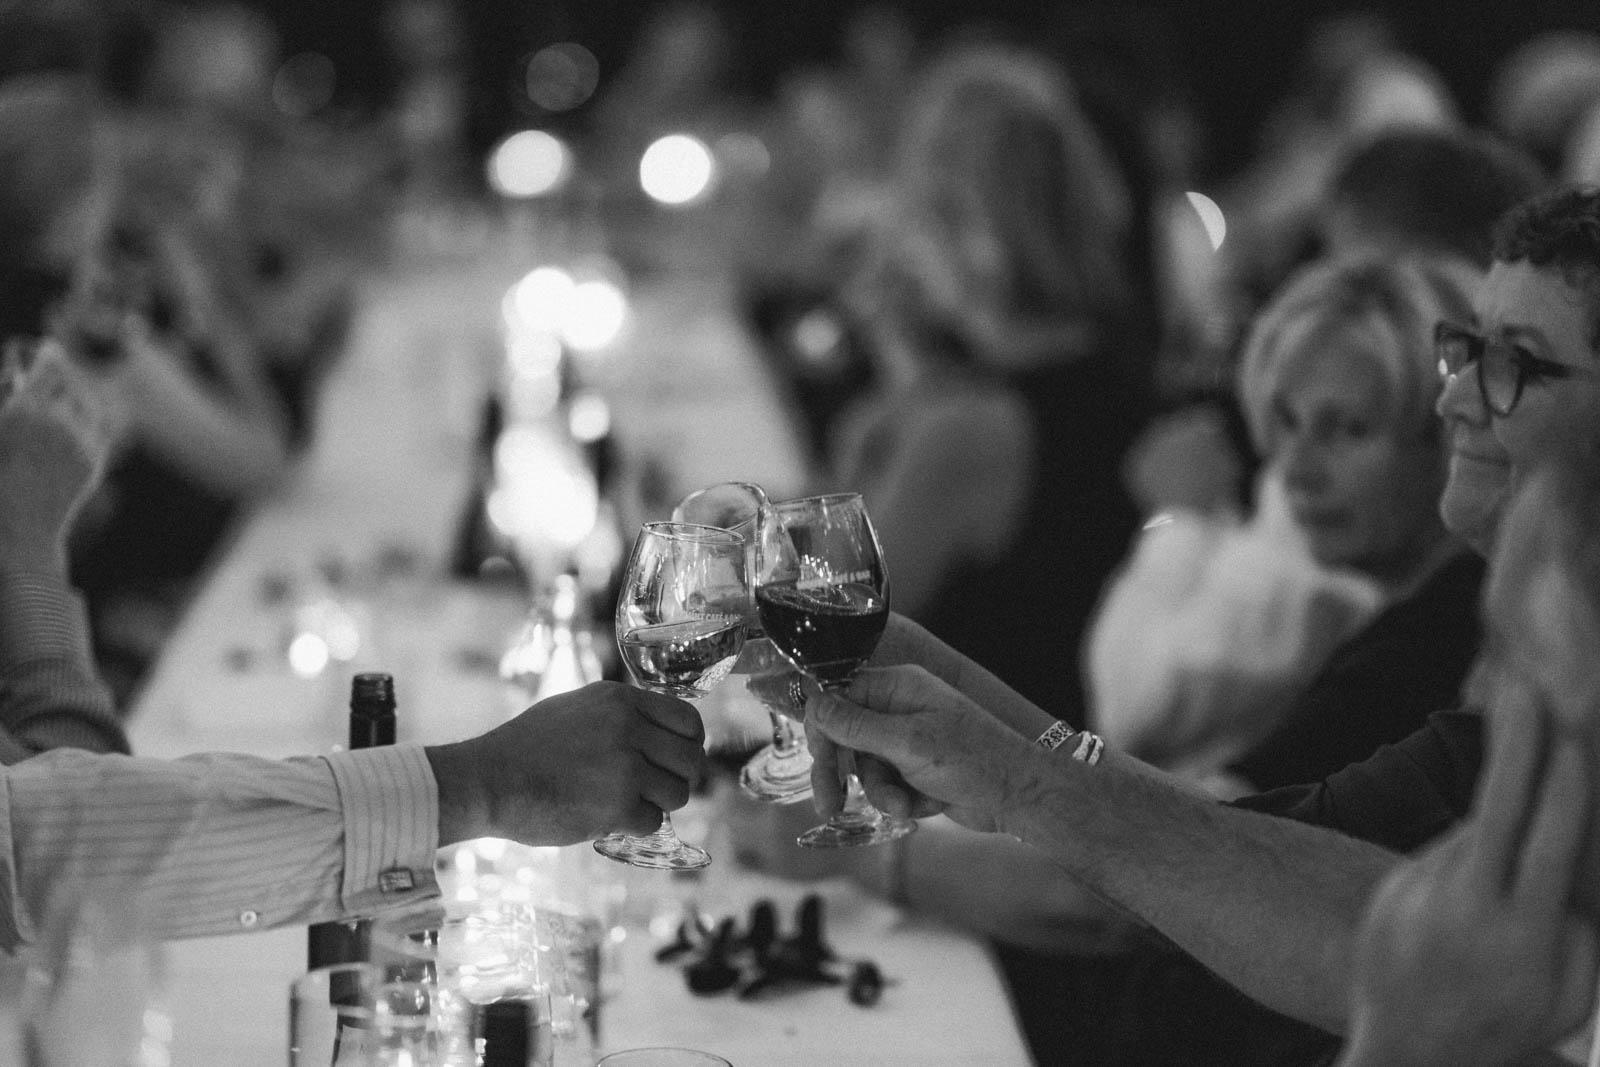 newfound-s-p-mt-maunganui-tauranga-wedding-photographer-2049-A9_09238